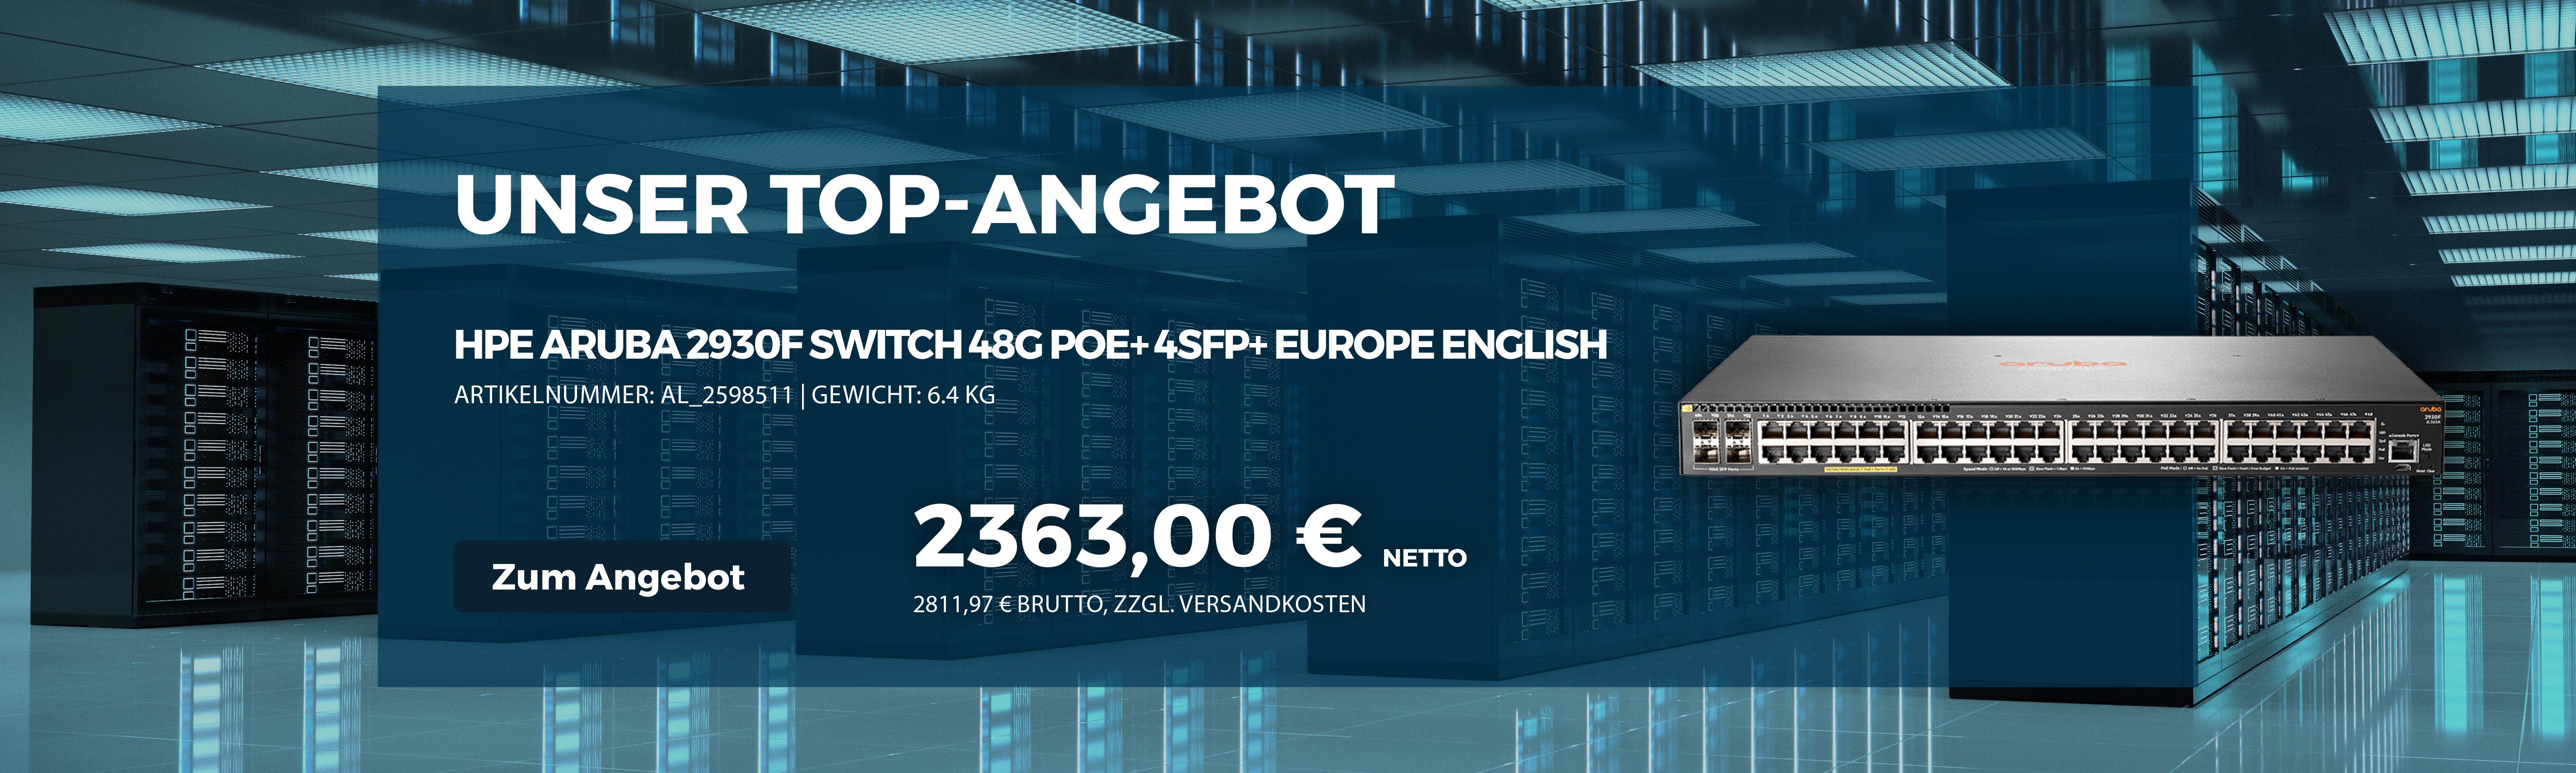 % Angebot - HPE Aruba 2930F Switch 48G